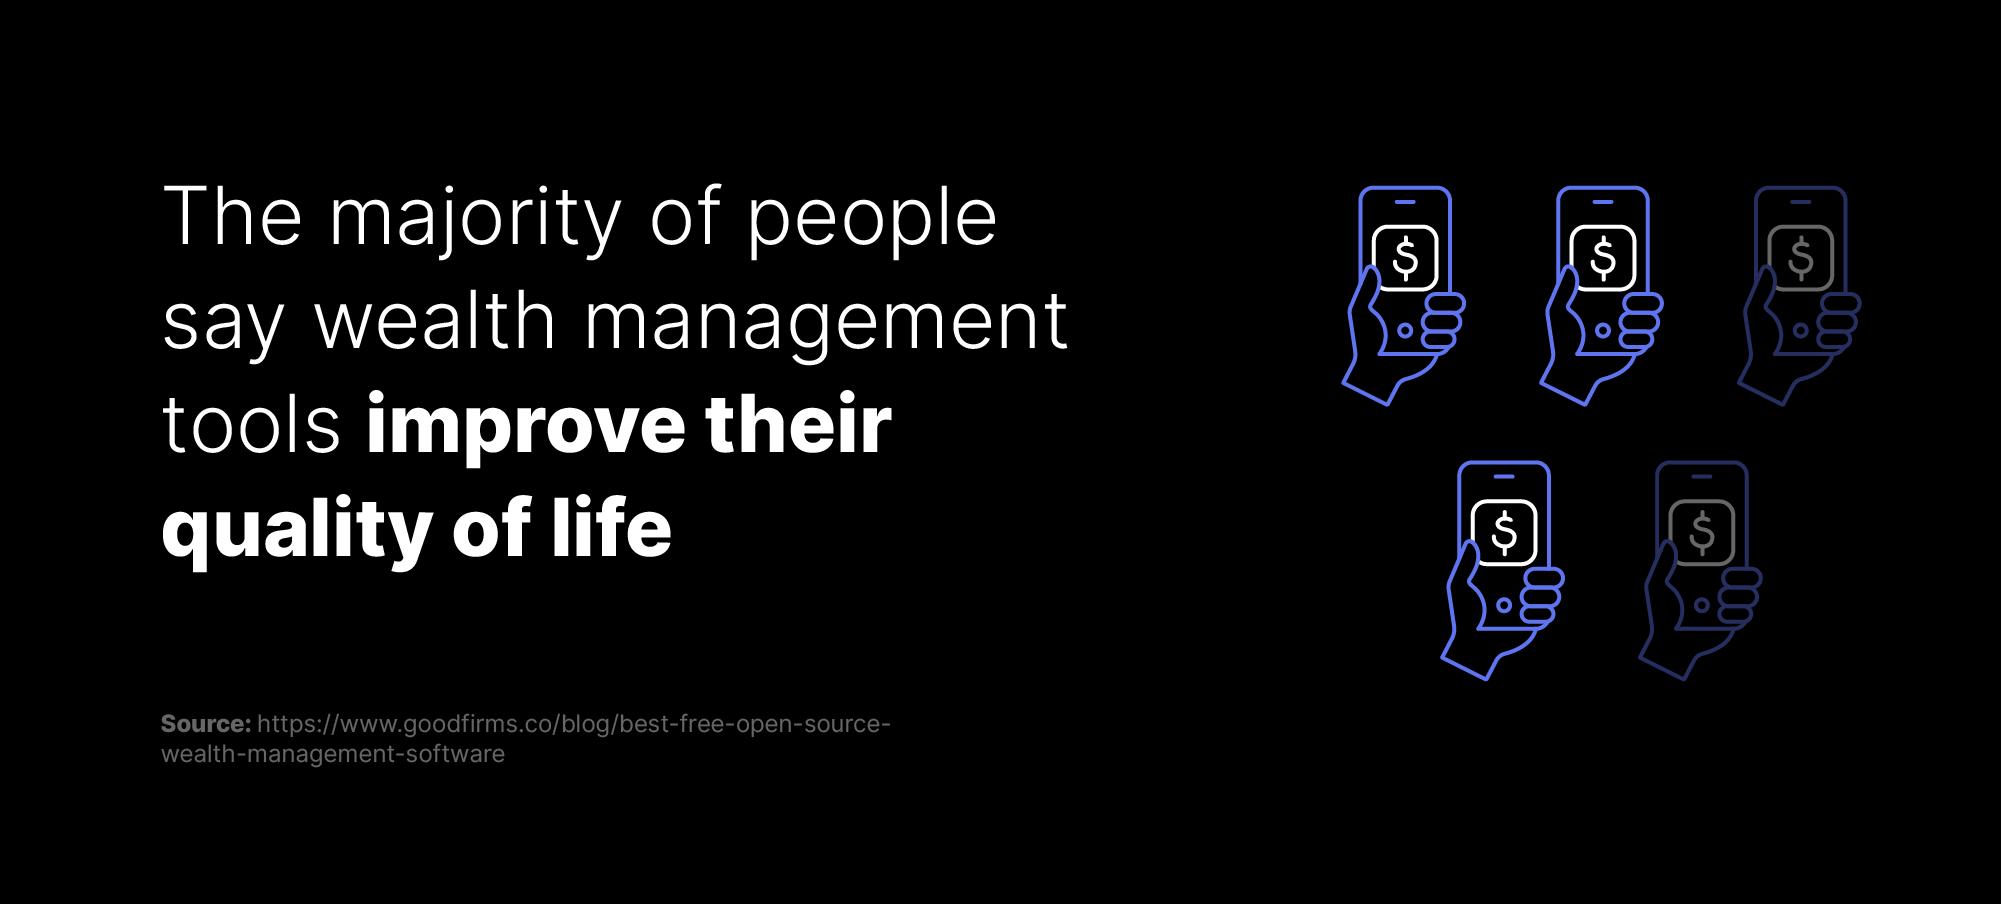 wealth management improve life